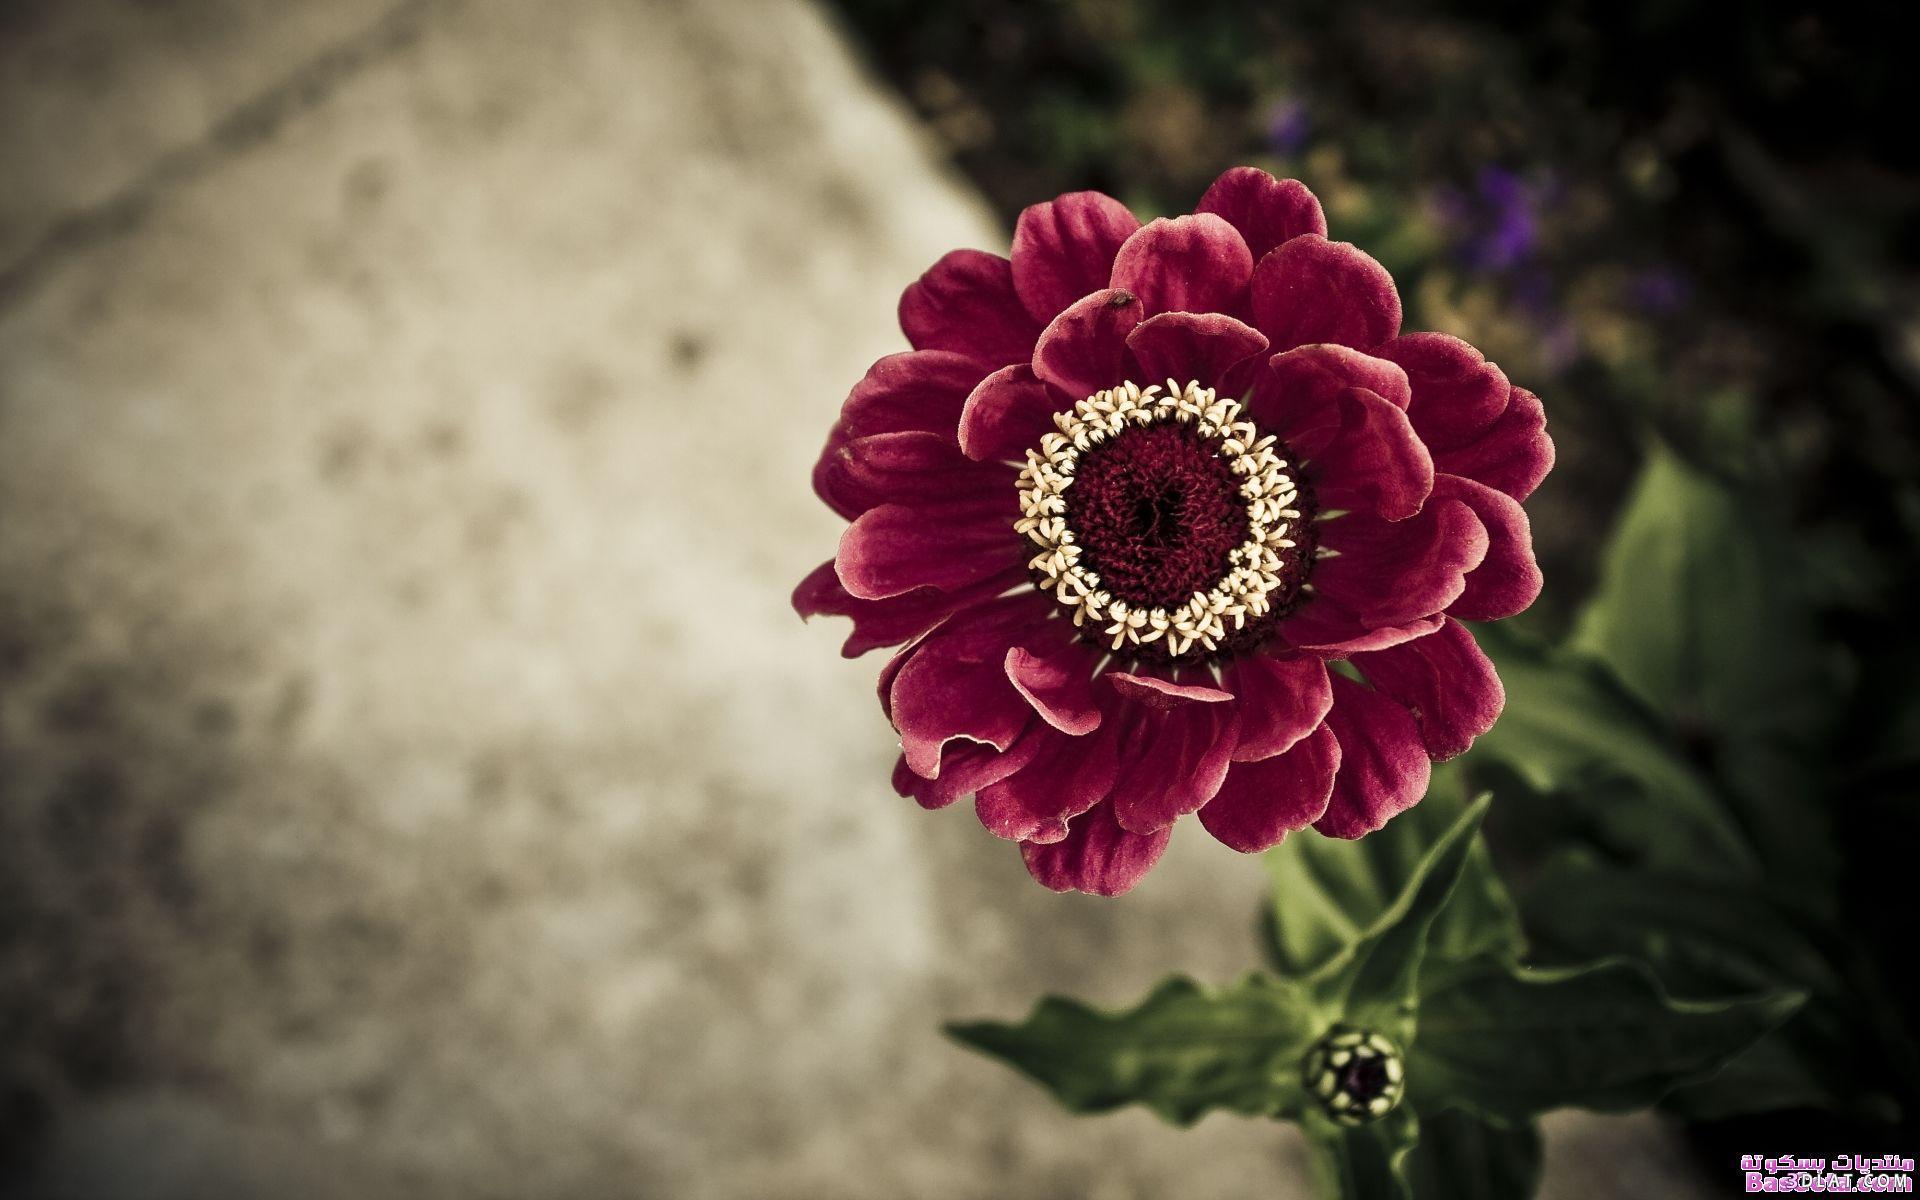 بالصور خلفية ورود وصو زهور جميلة 735d0e6a899edd6e8d02ae15fd252d7f